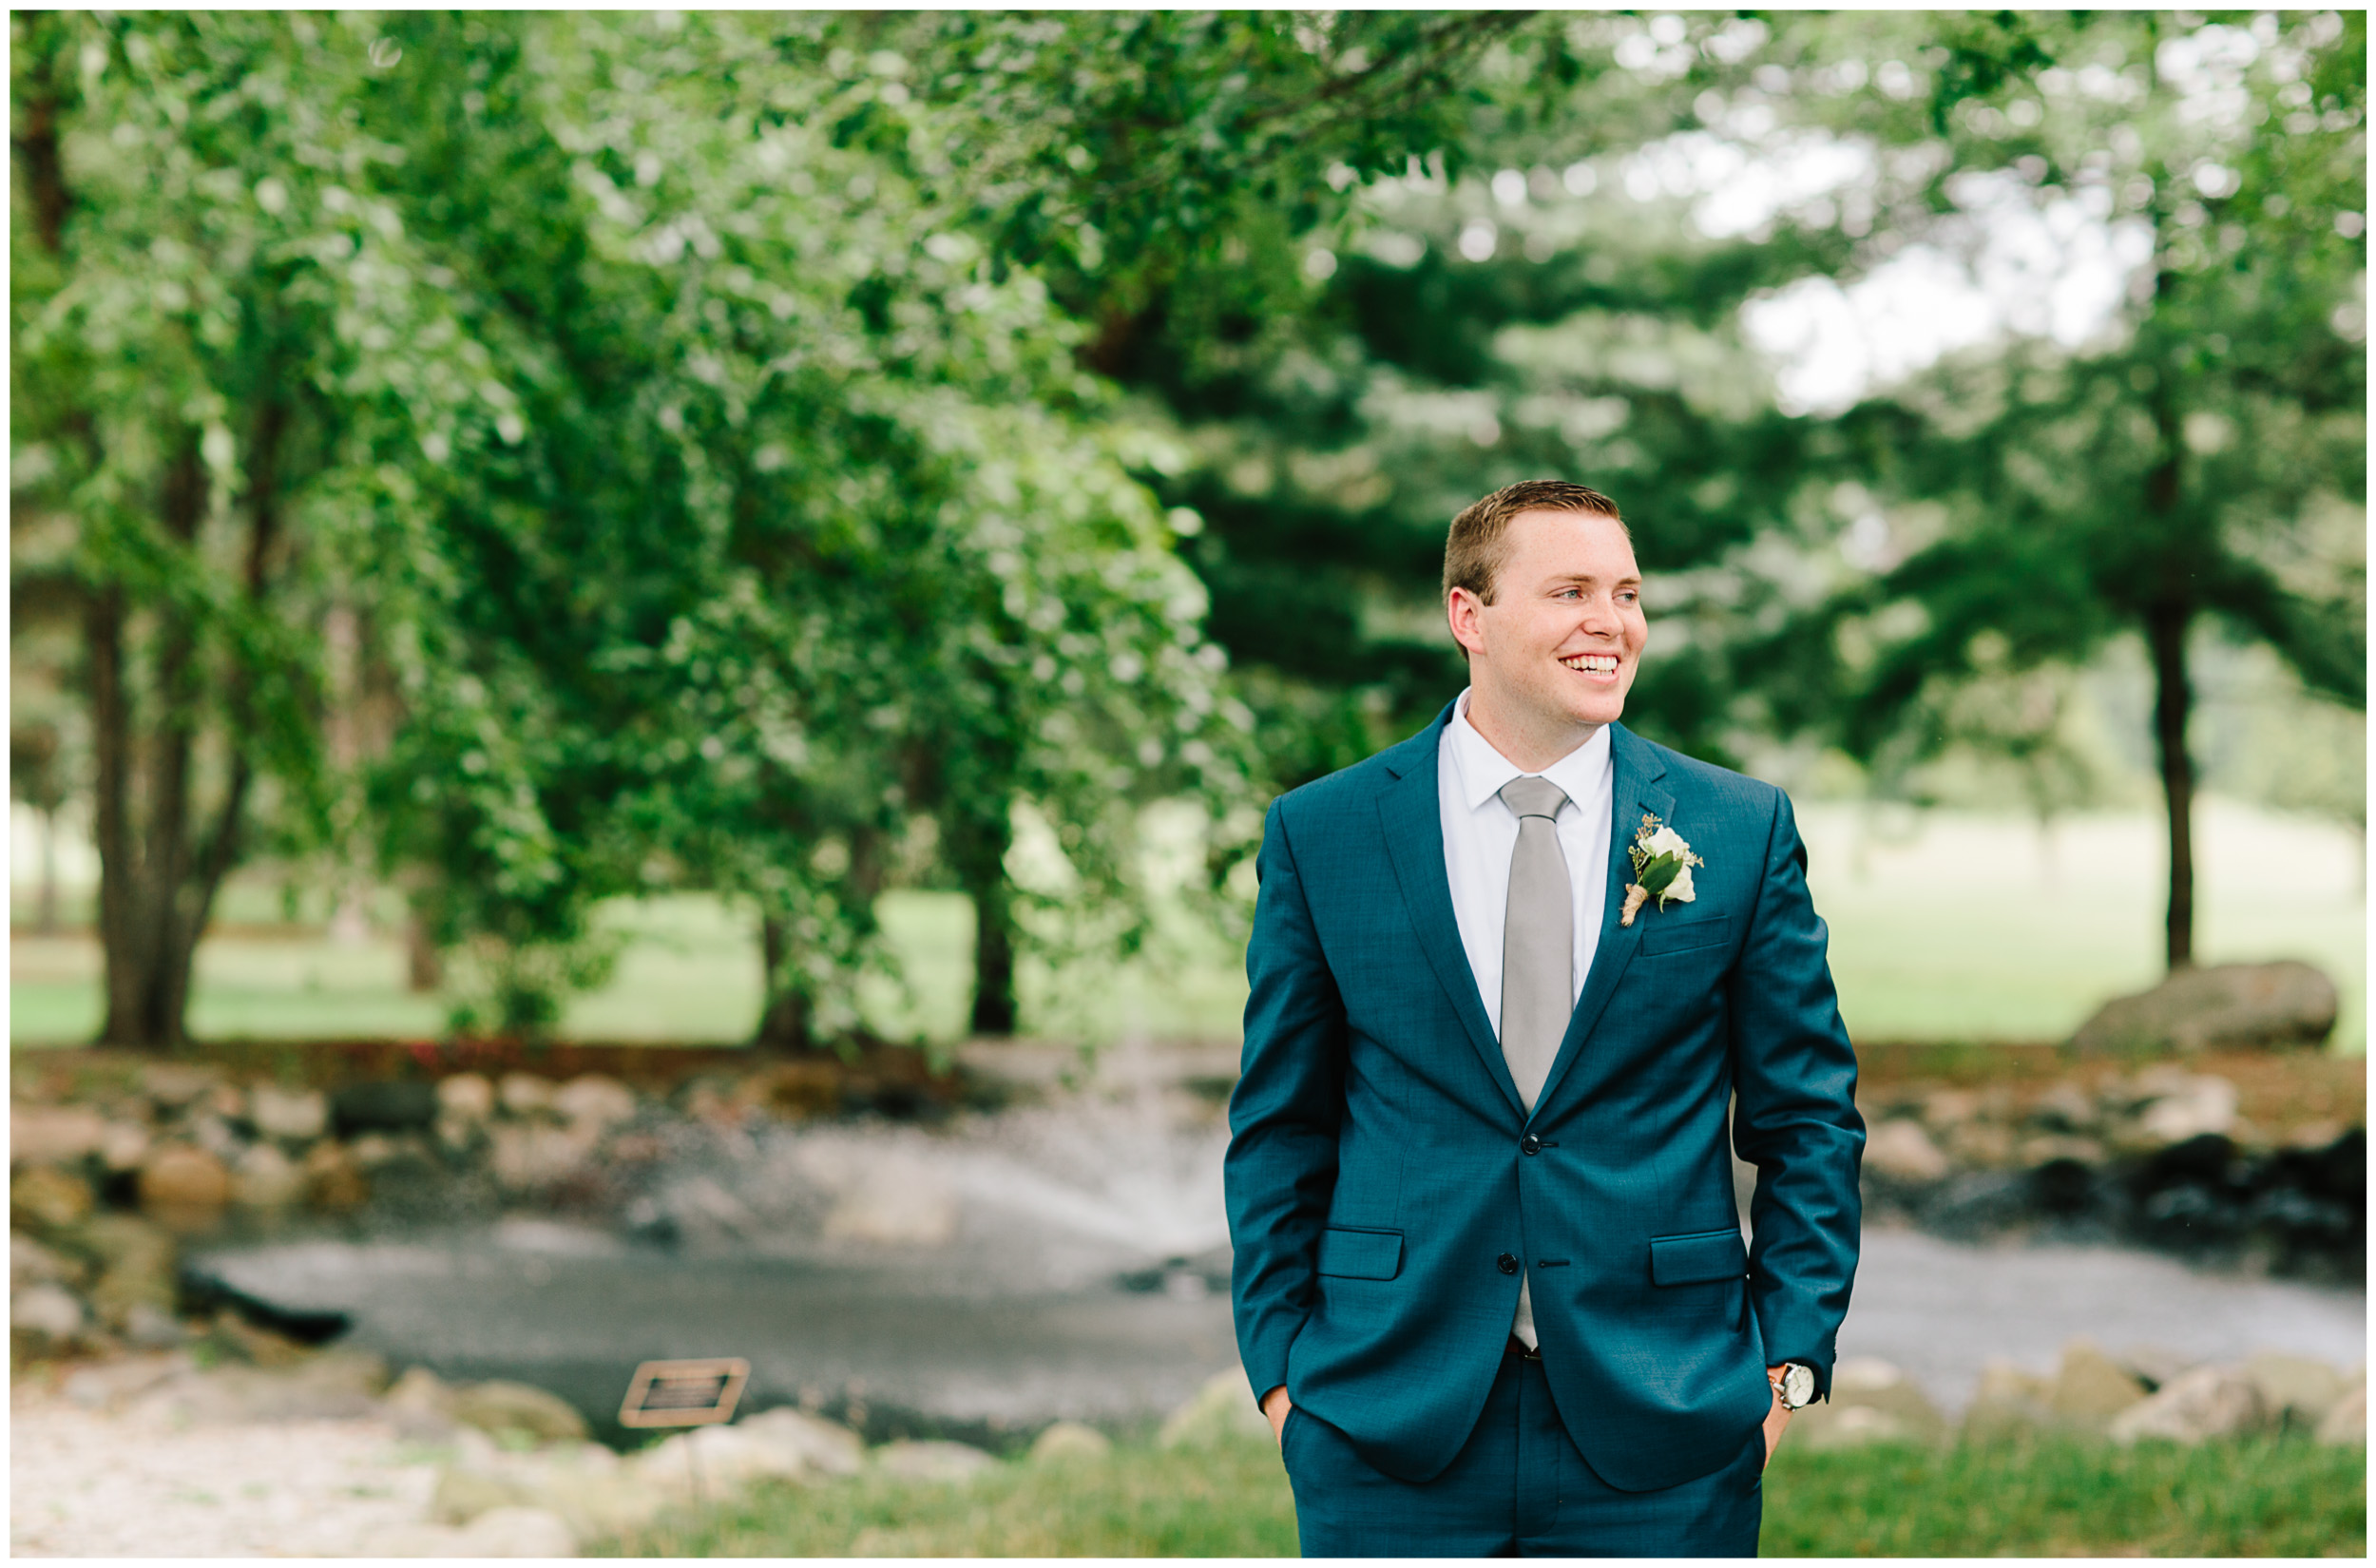 ann_arbor_michigan_wedding_49.jpg